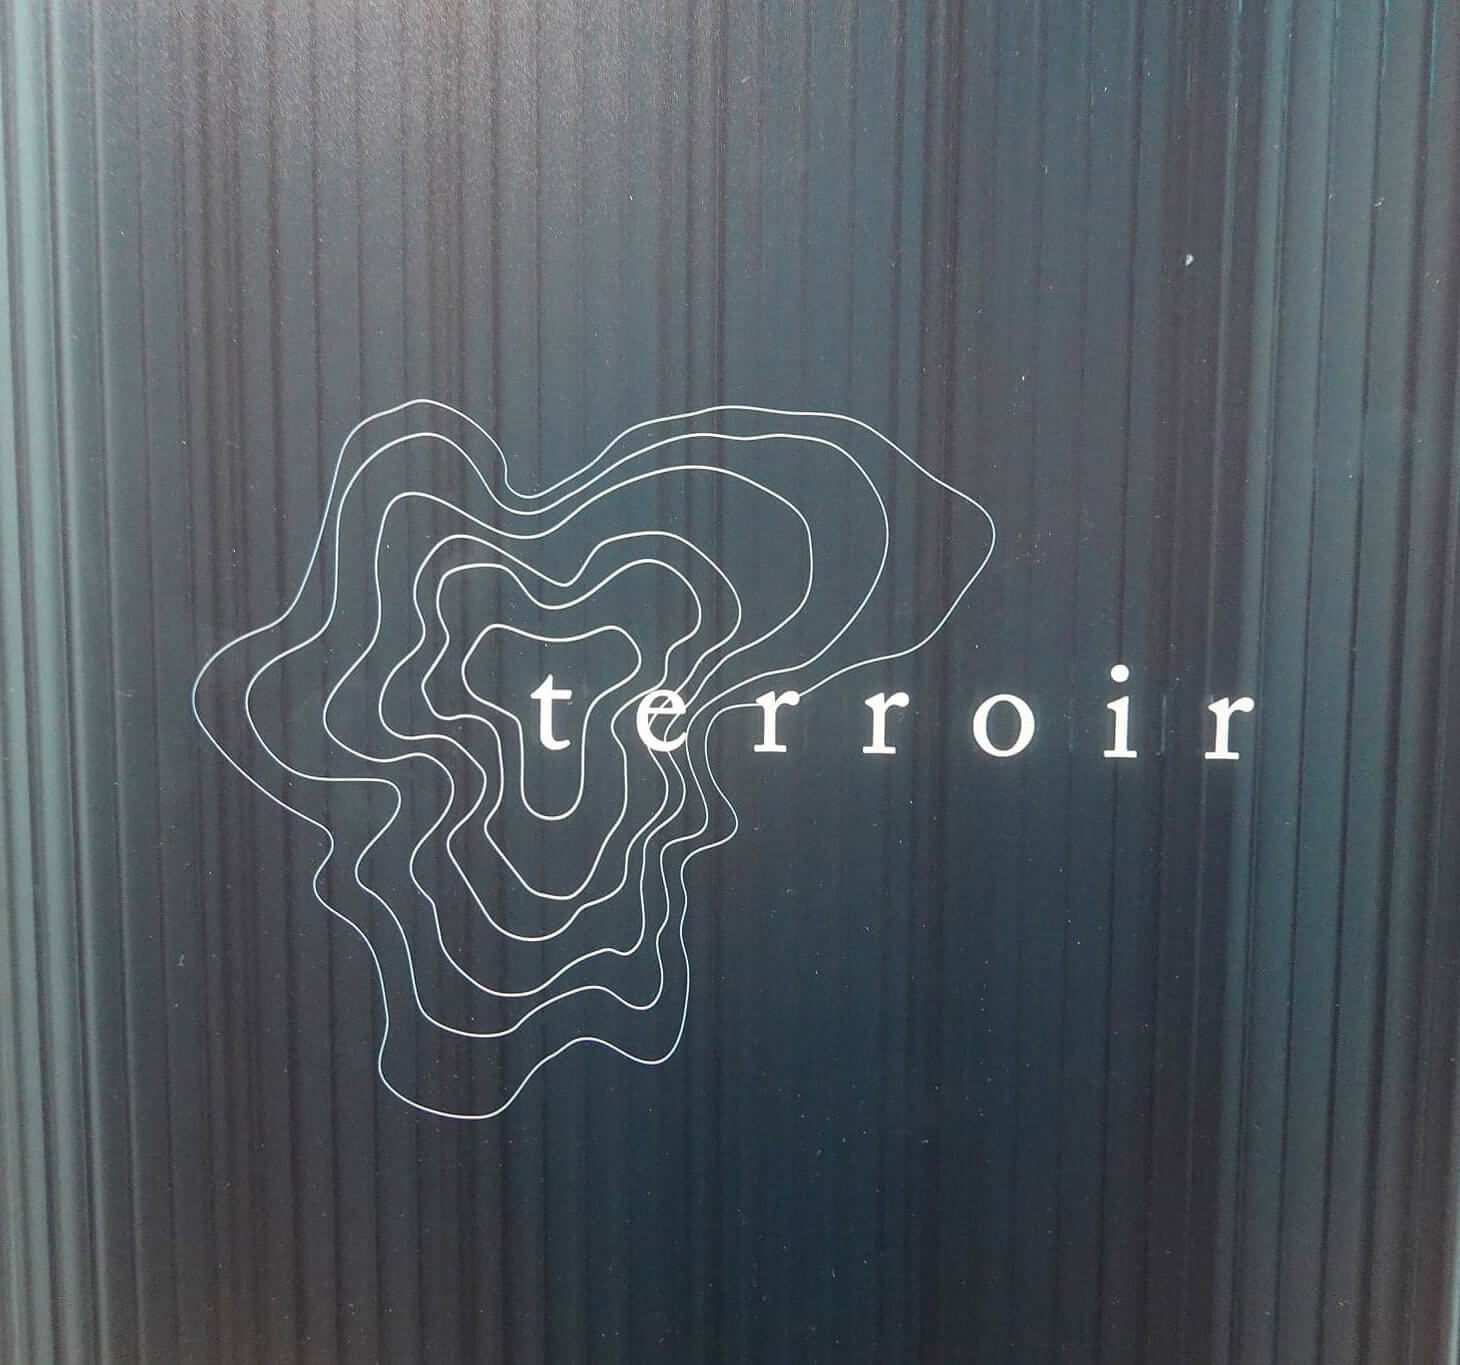 terroir的標誌都甚有土地元素。